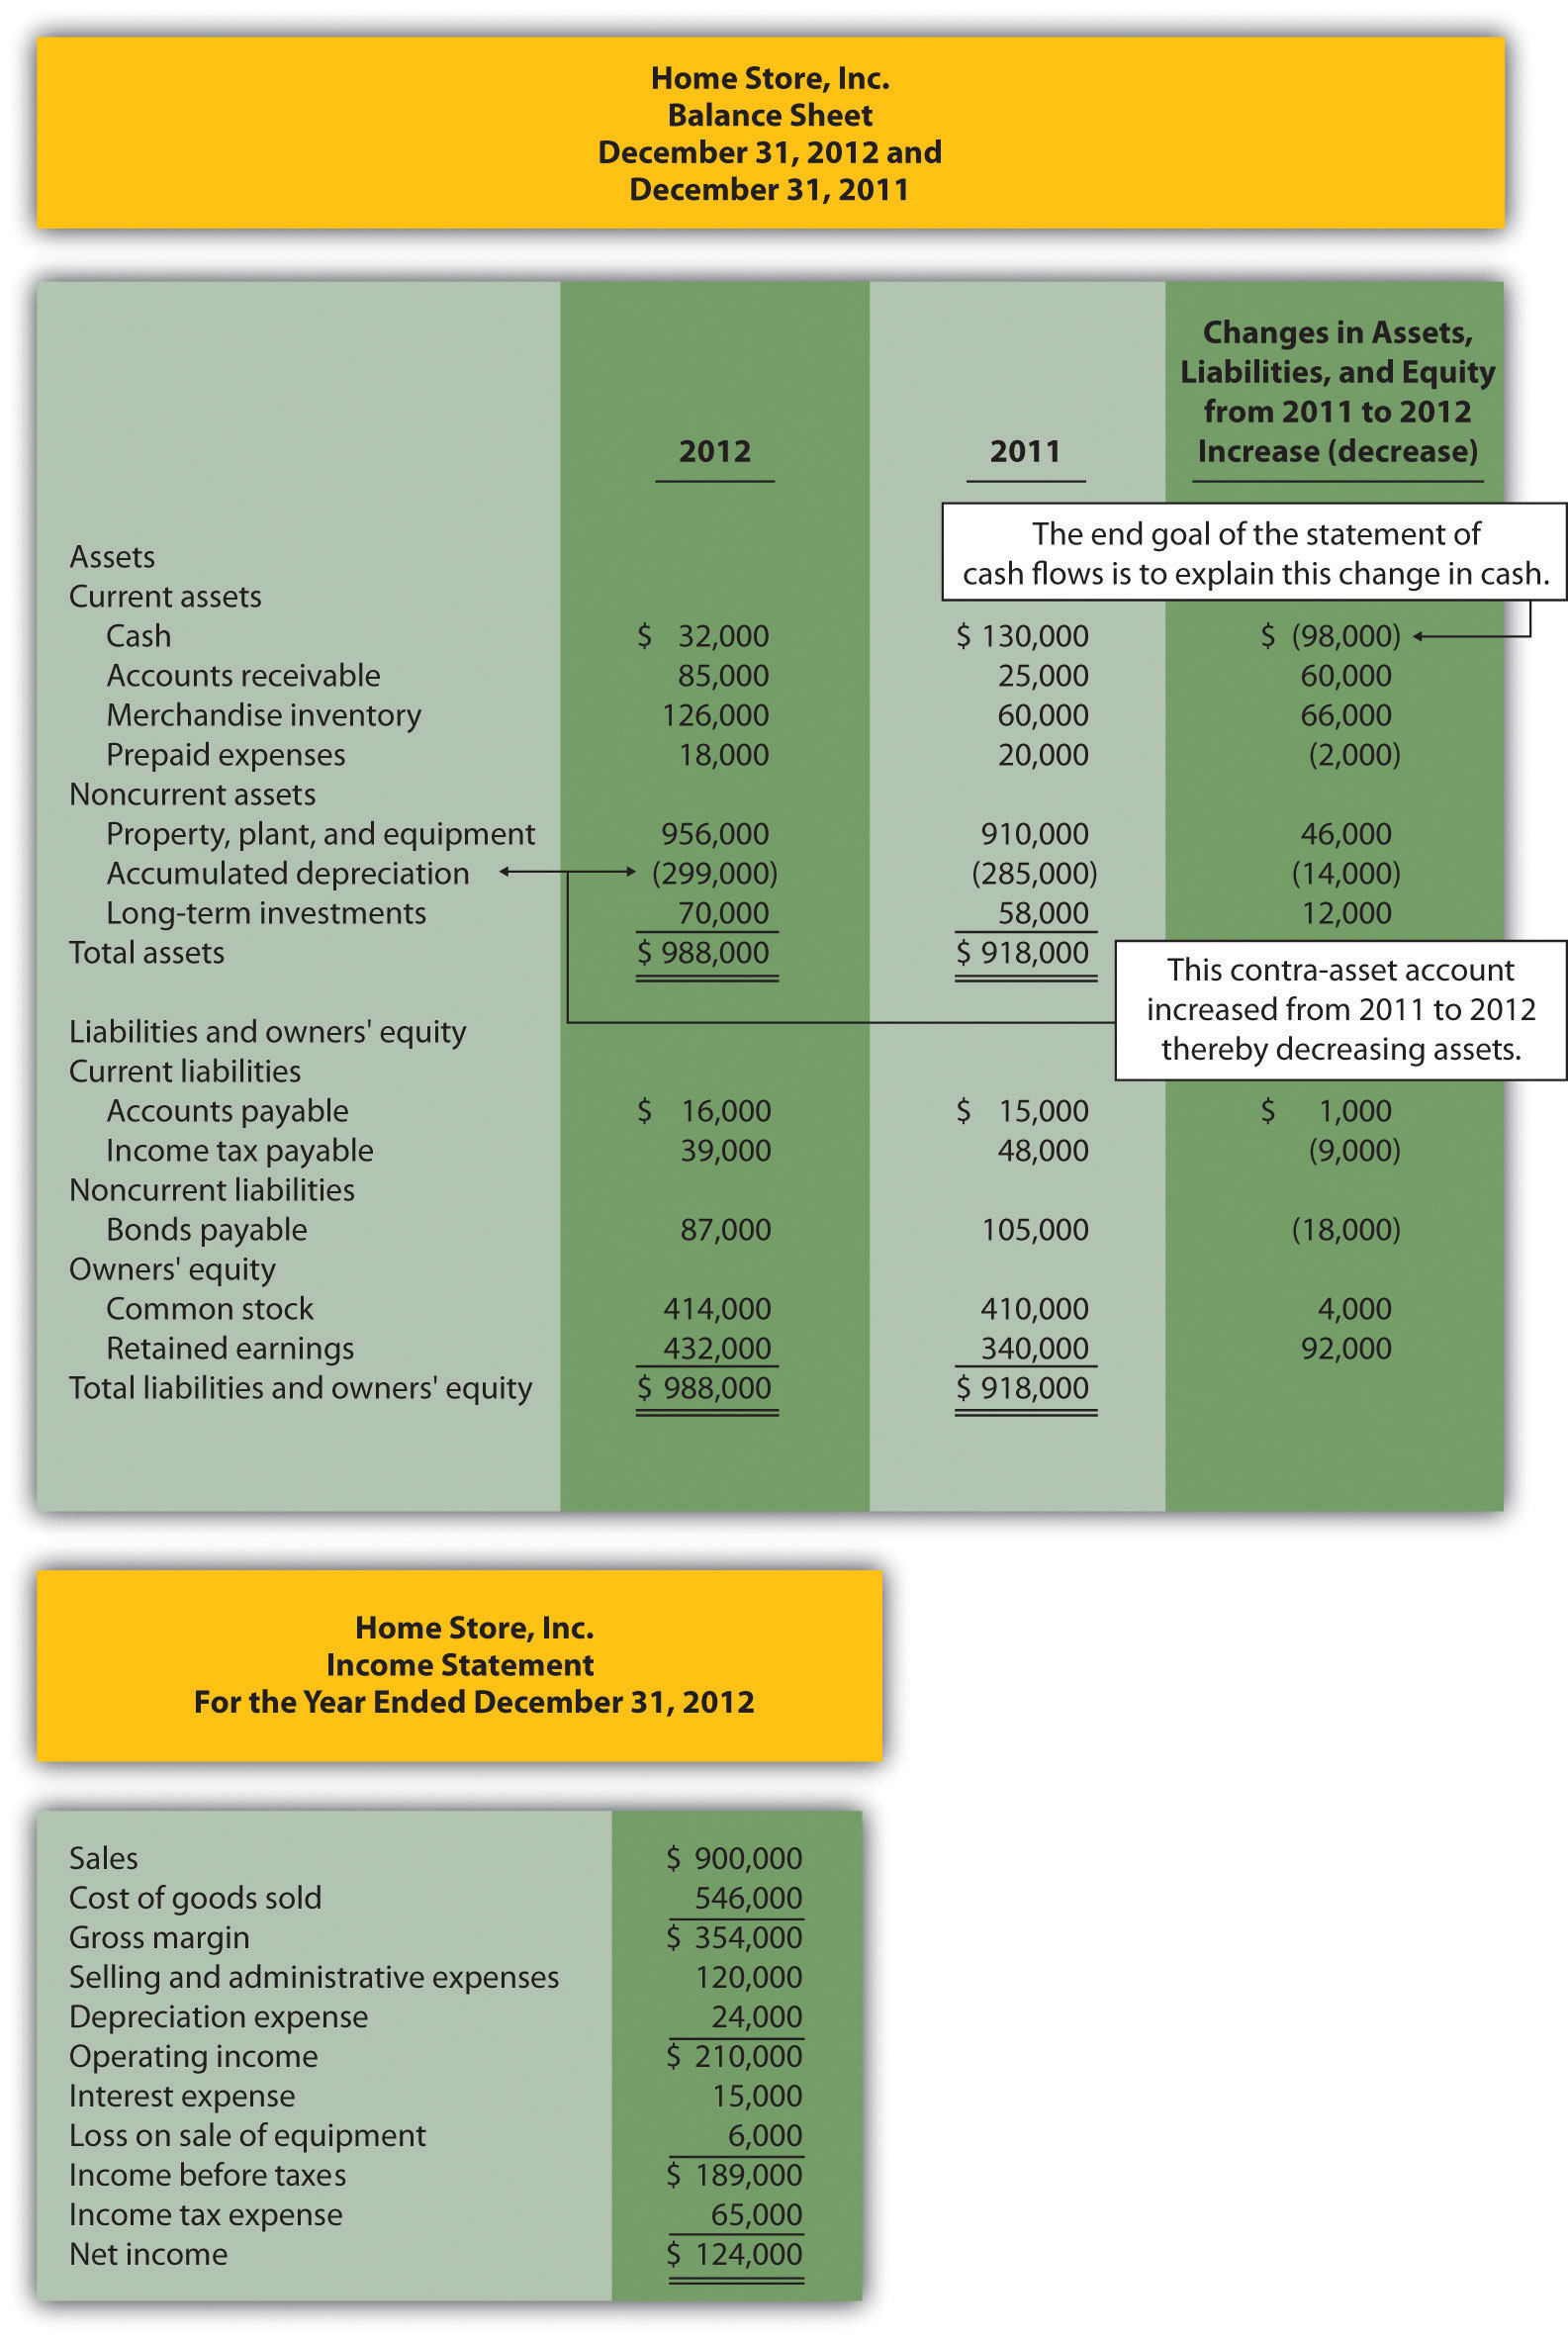 Bus105 Unit 10 Study Guide Cash Flow Preparation And Use